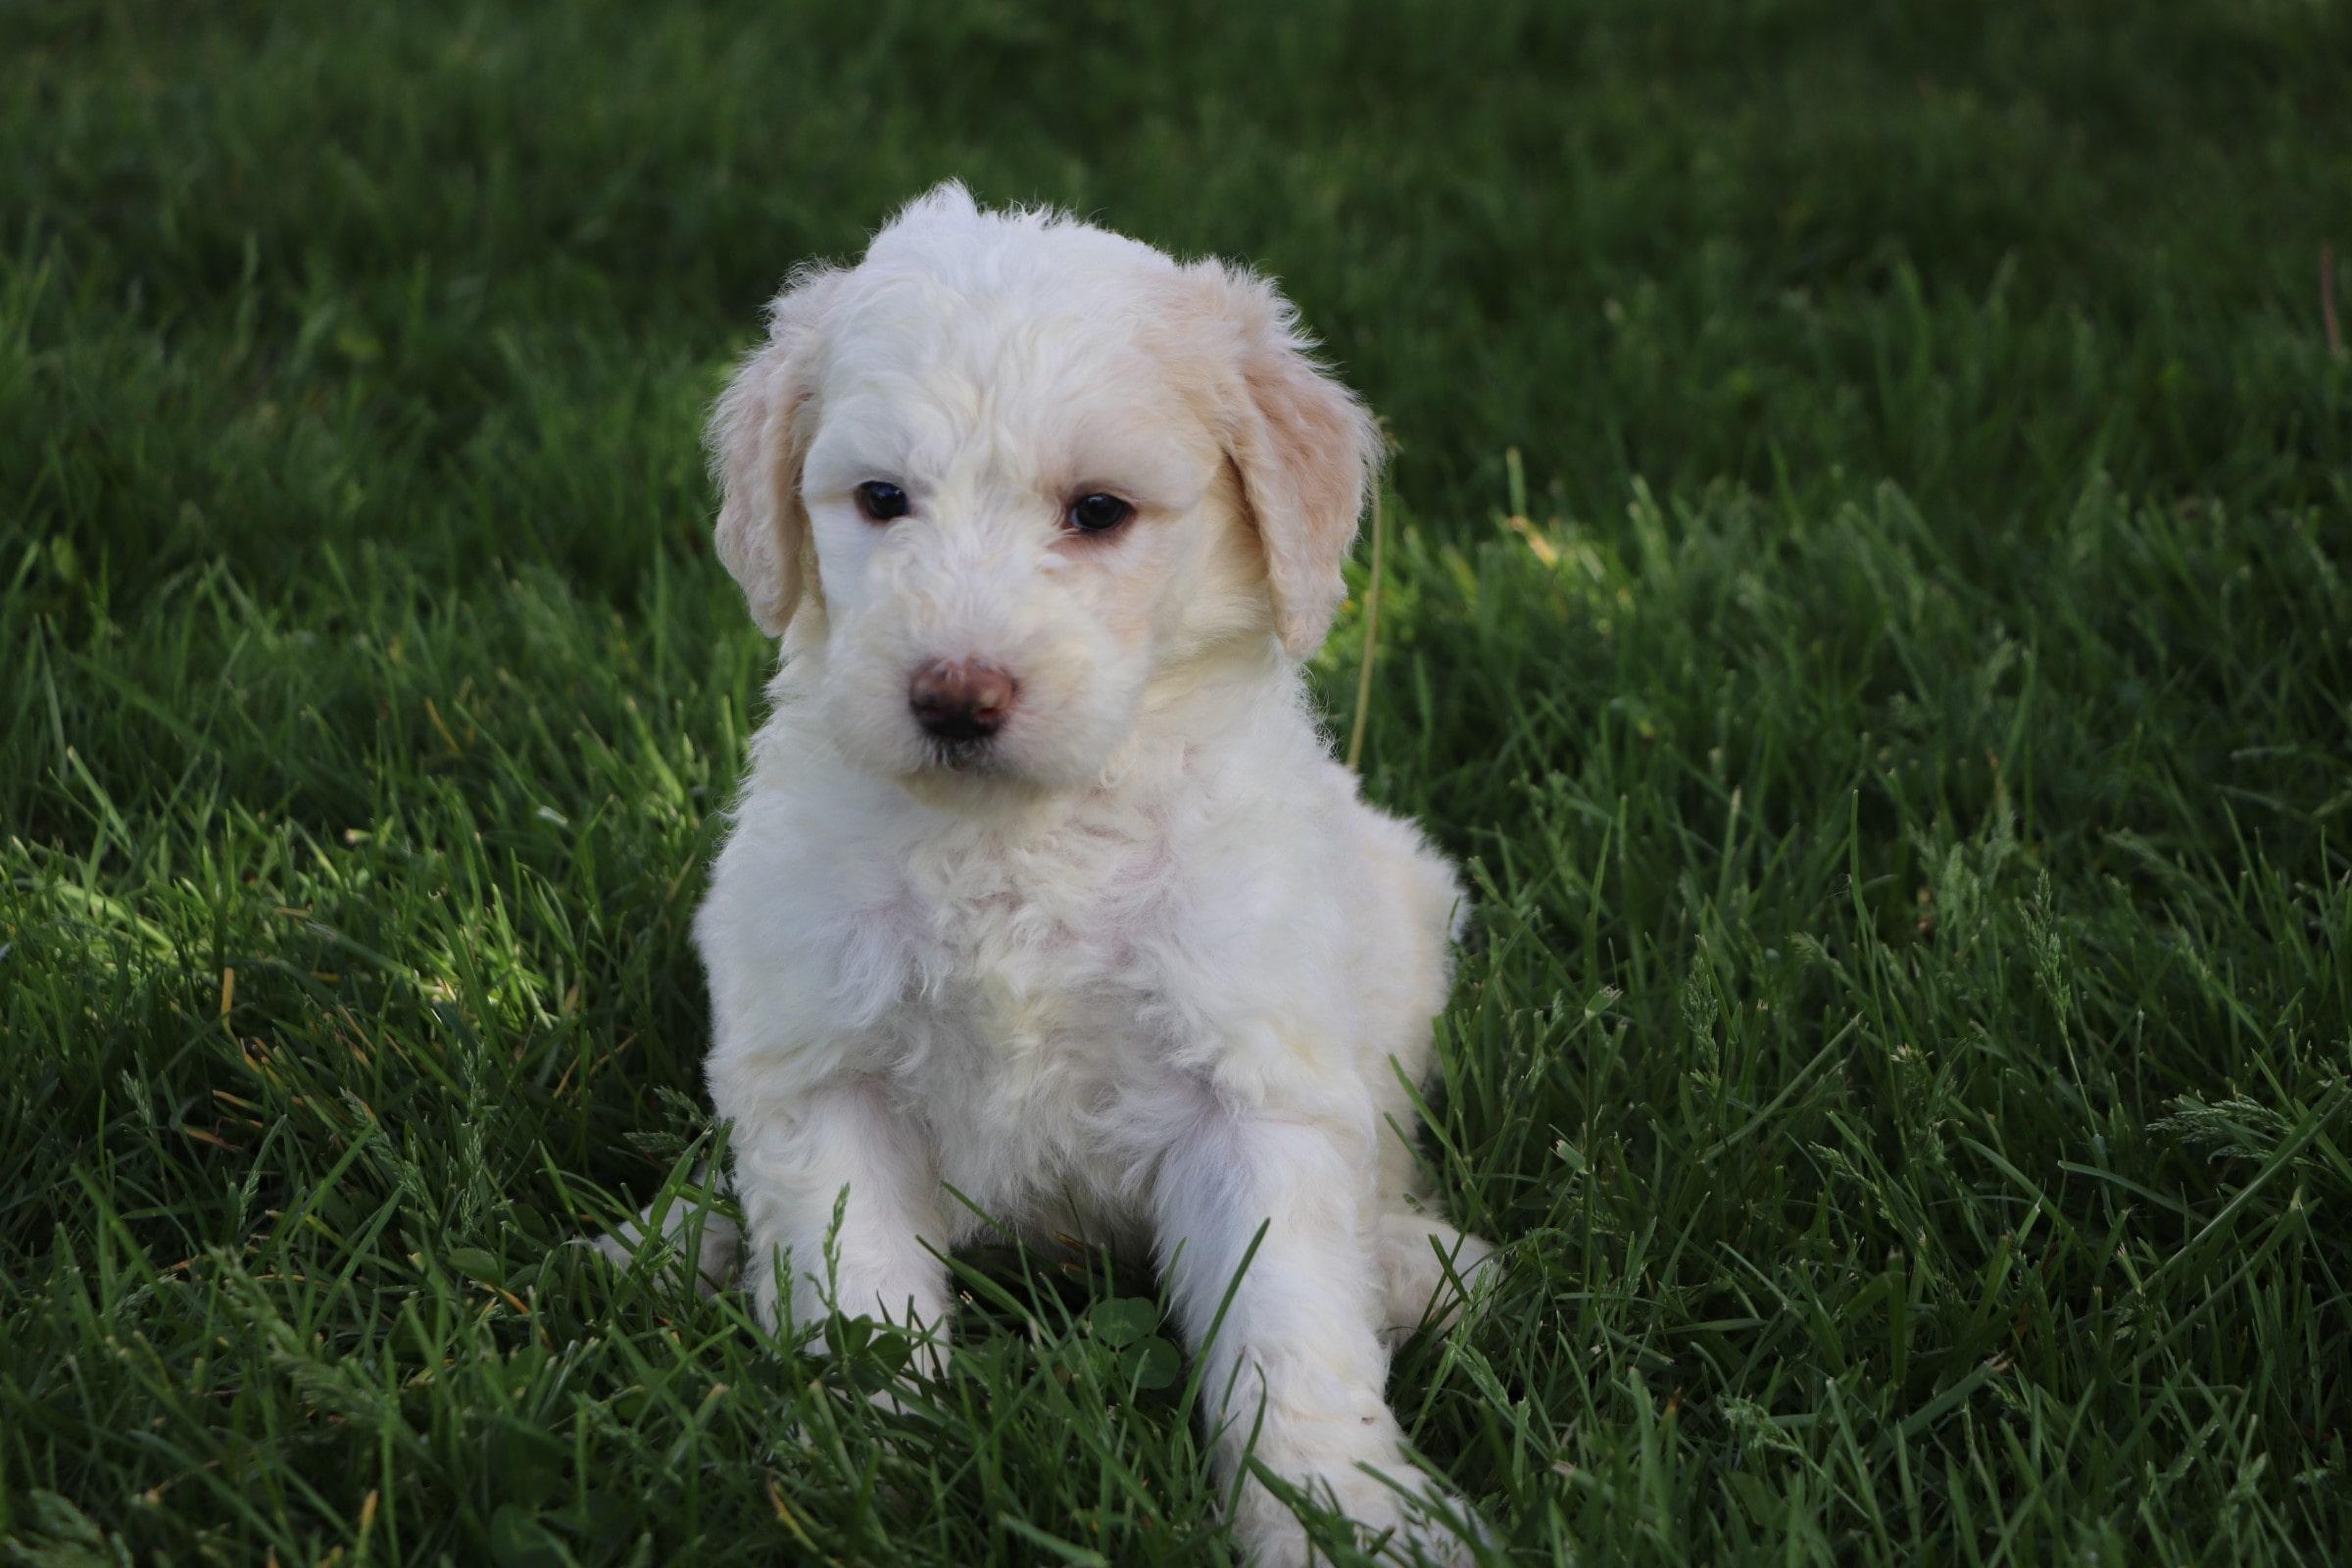 Lily Adorable Sheepadoodle Puppy (7).jpg